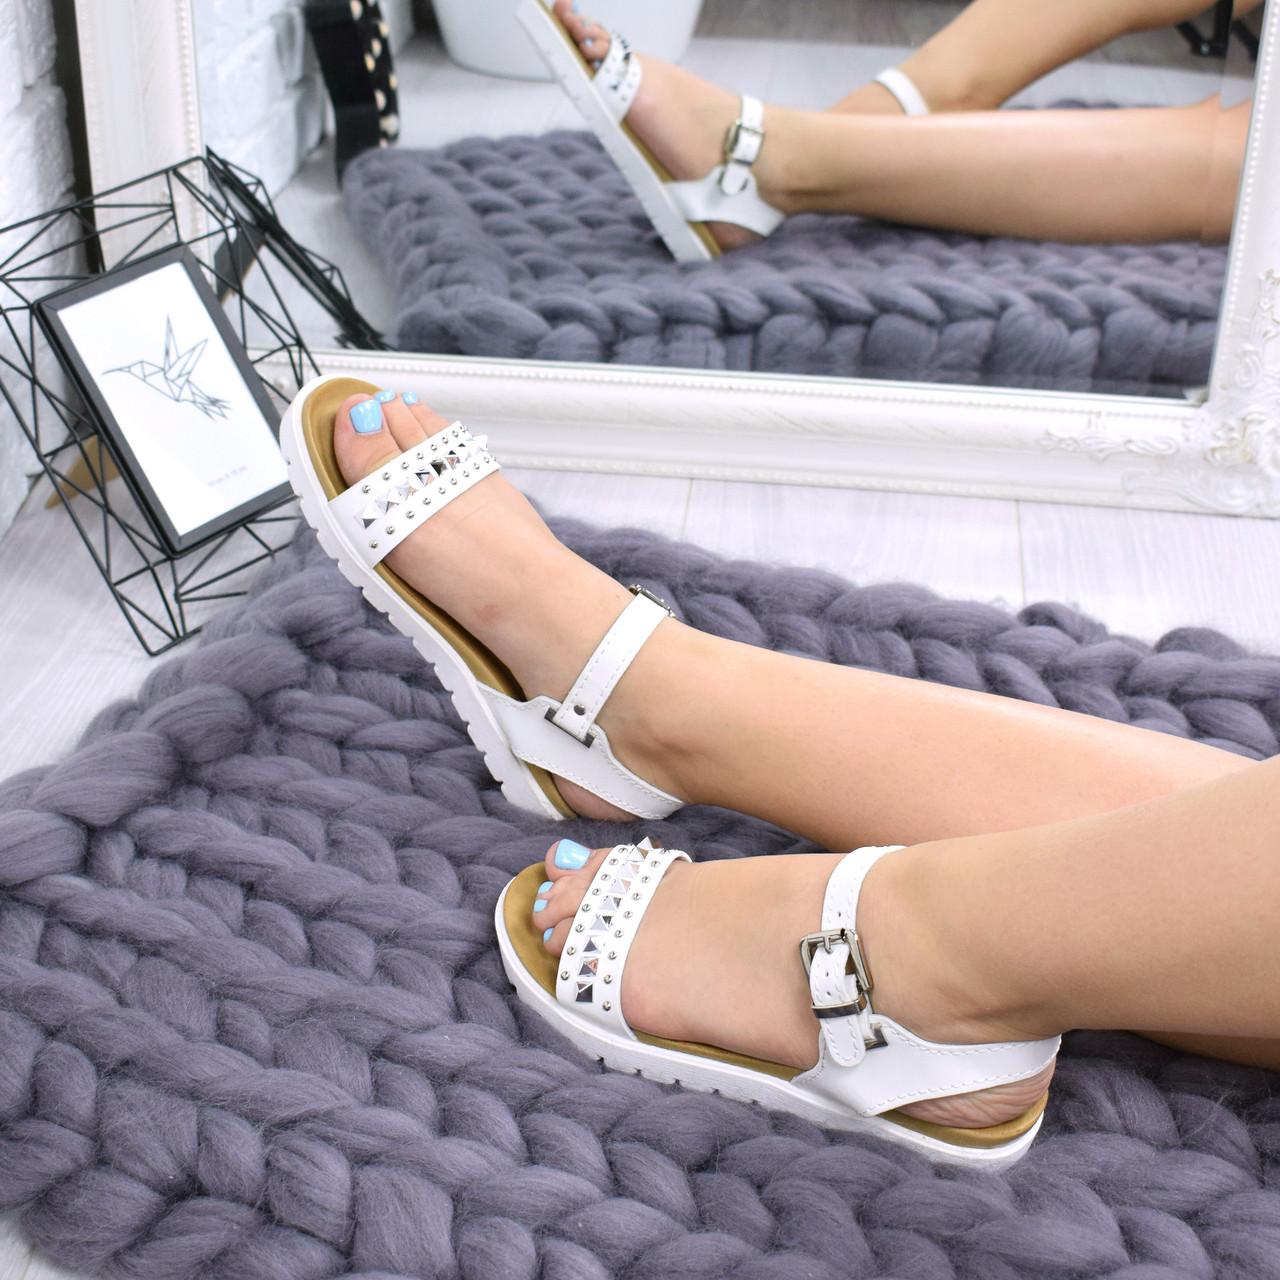 111310806 Босоножки, вьетнамки сандали, сабо, женские